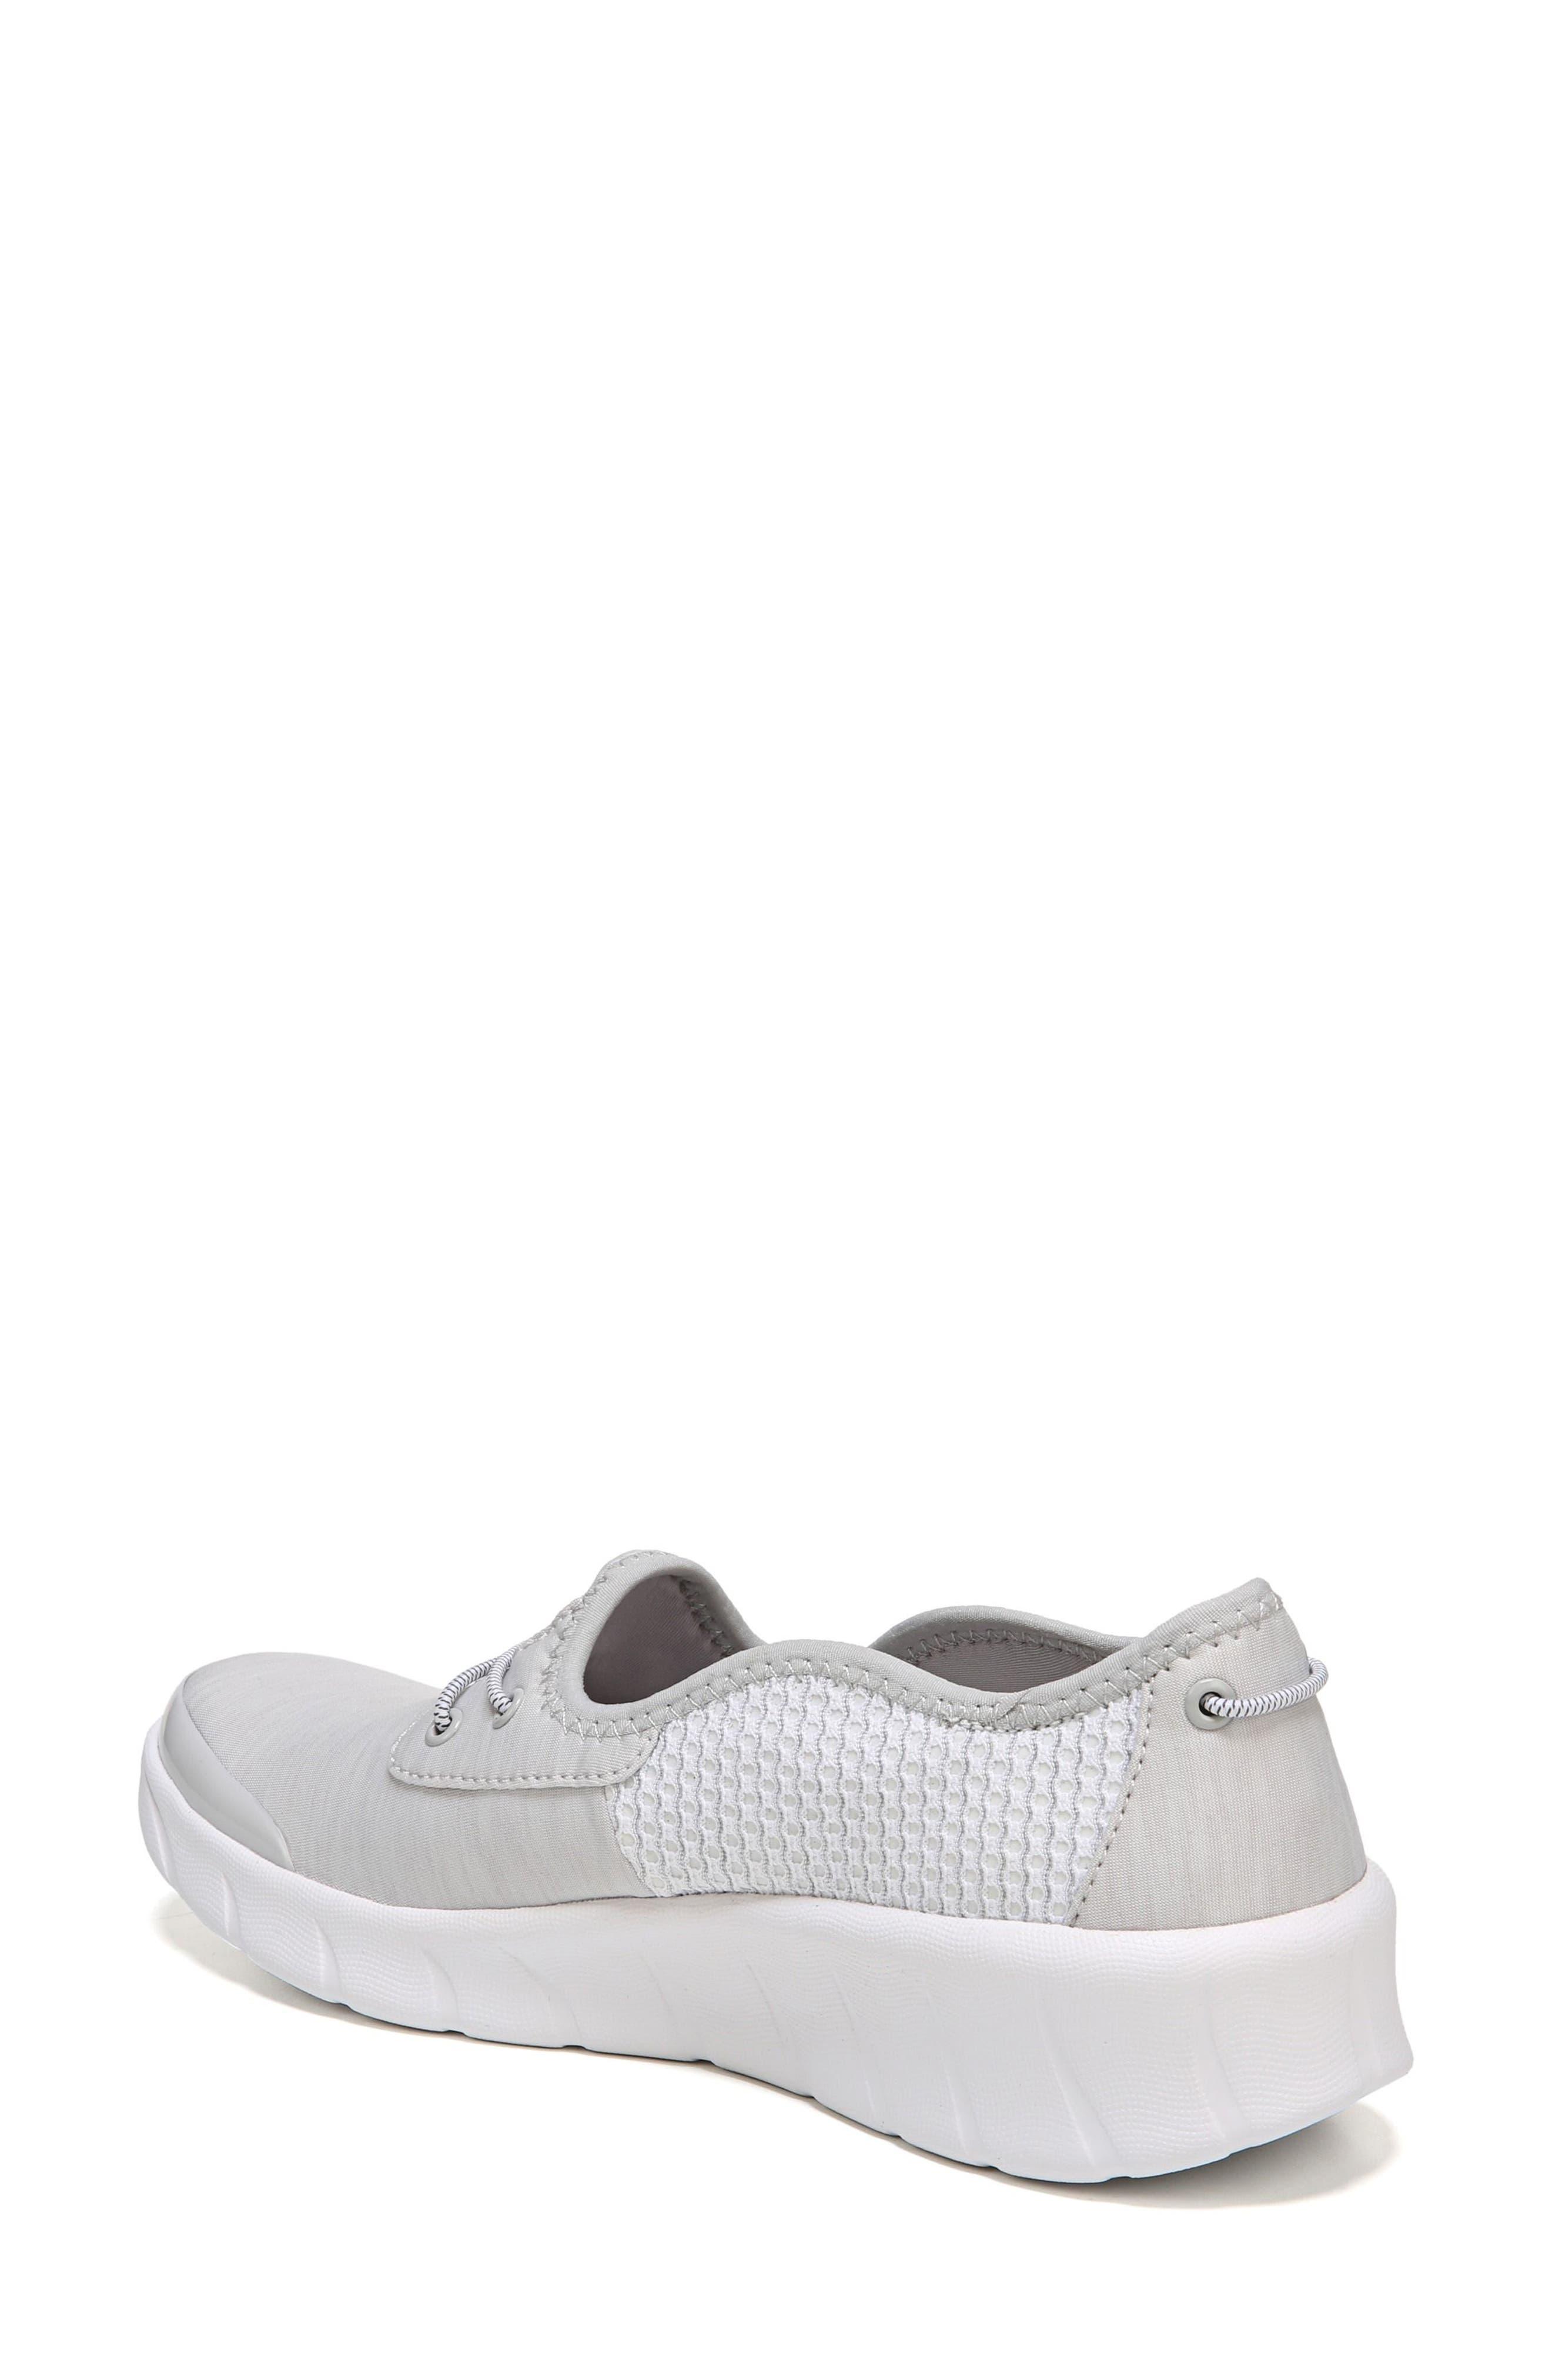 Oz Slip-On Sneaker,                             Alternate thumbnail 2, color,                             Grey Fabric